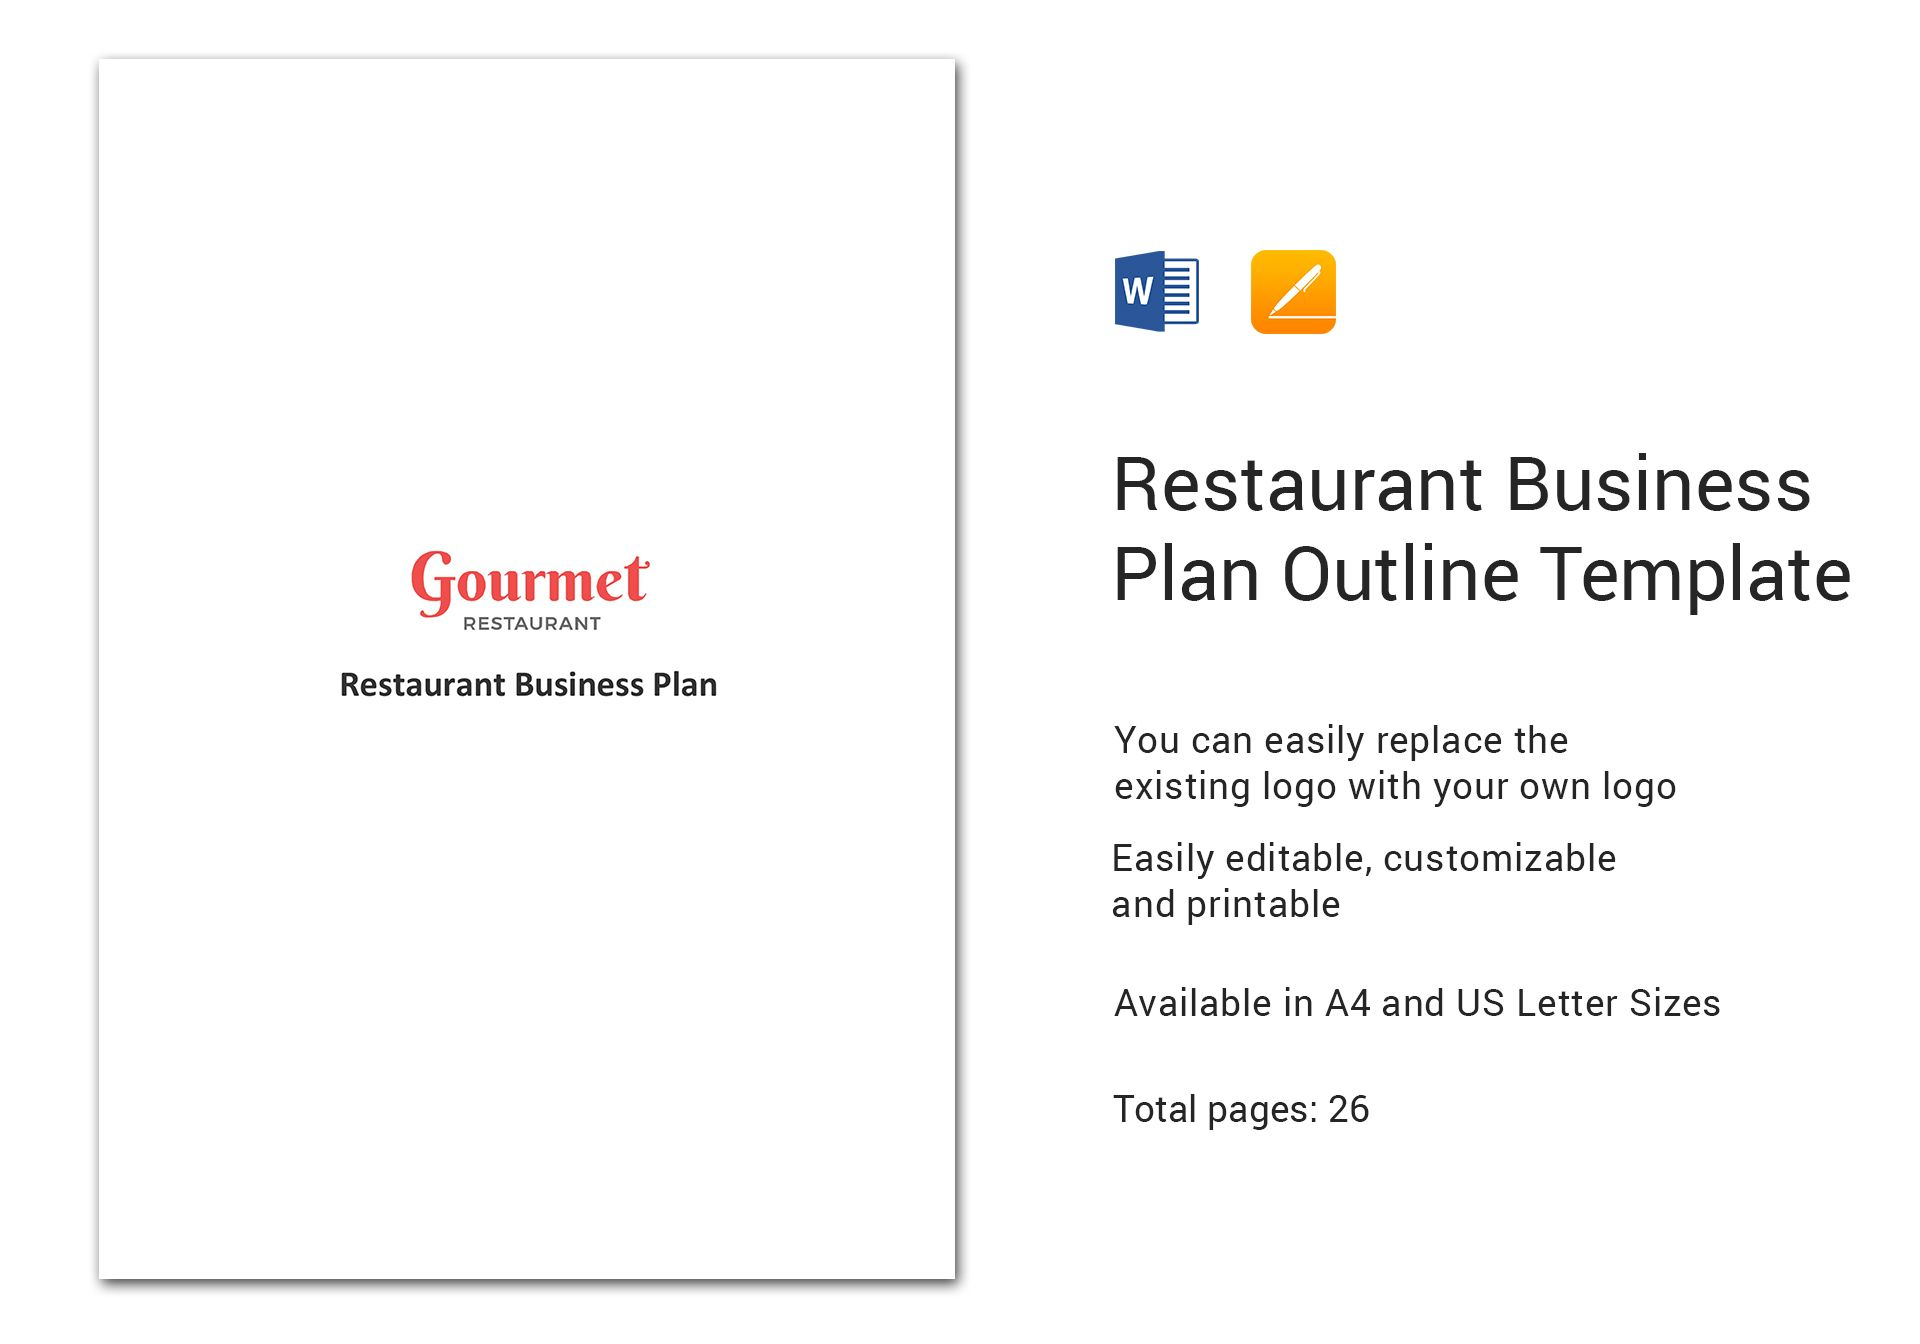 Restaurant Business Plan Outline